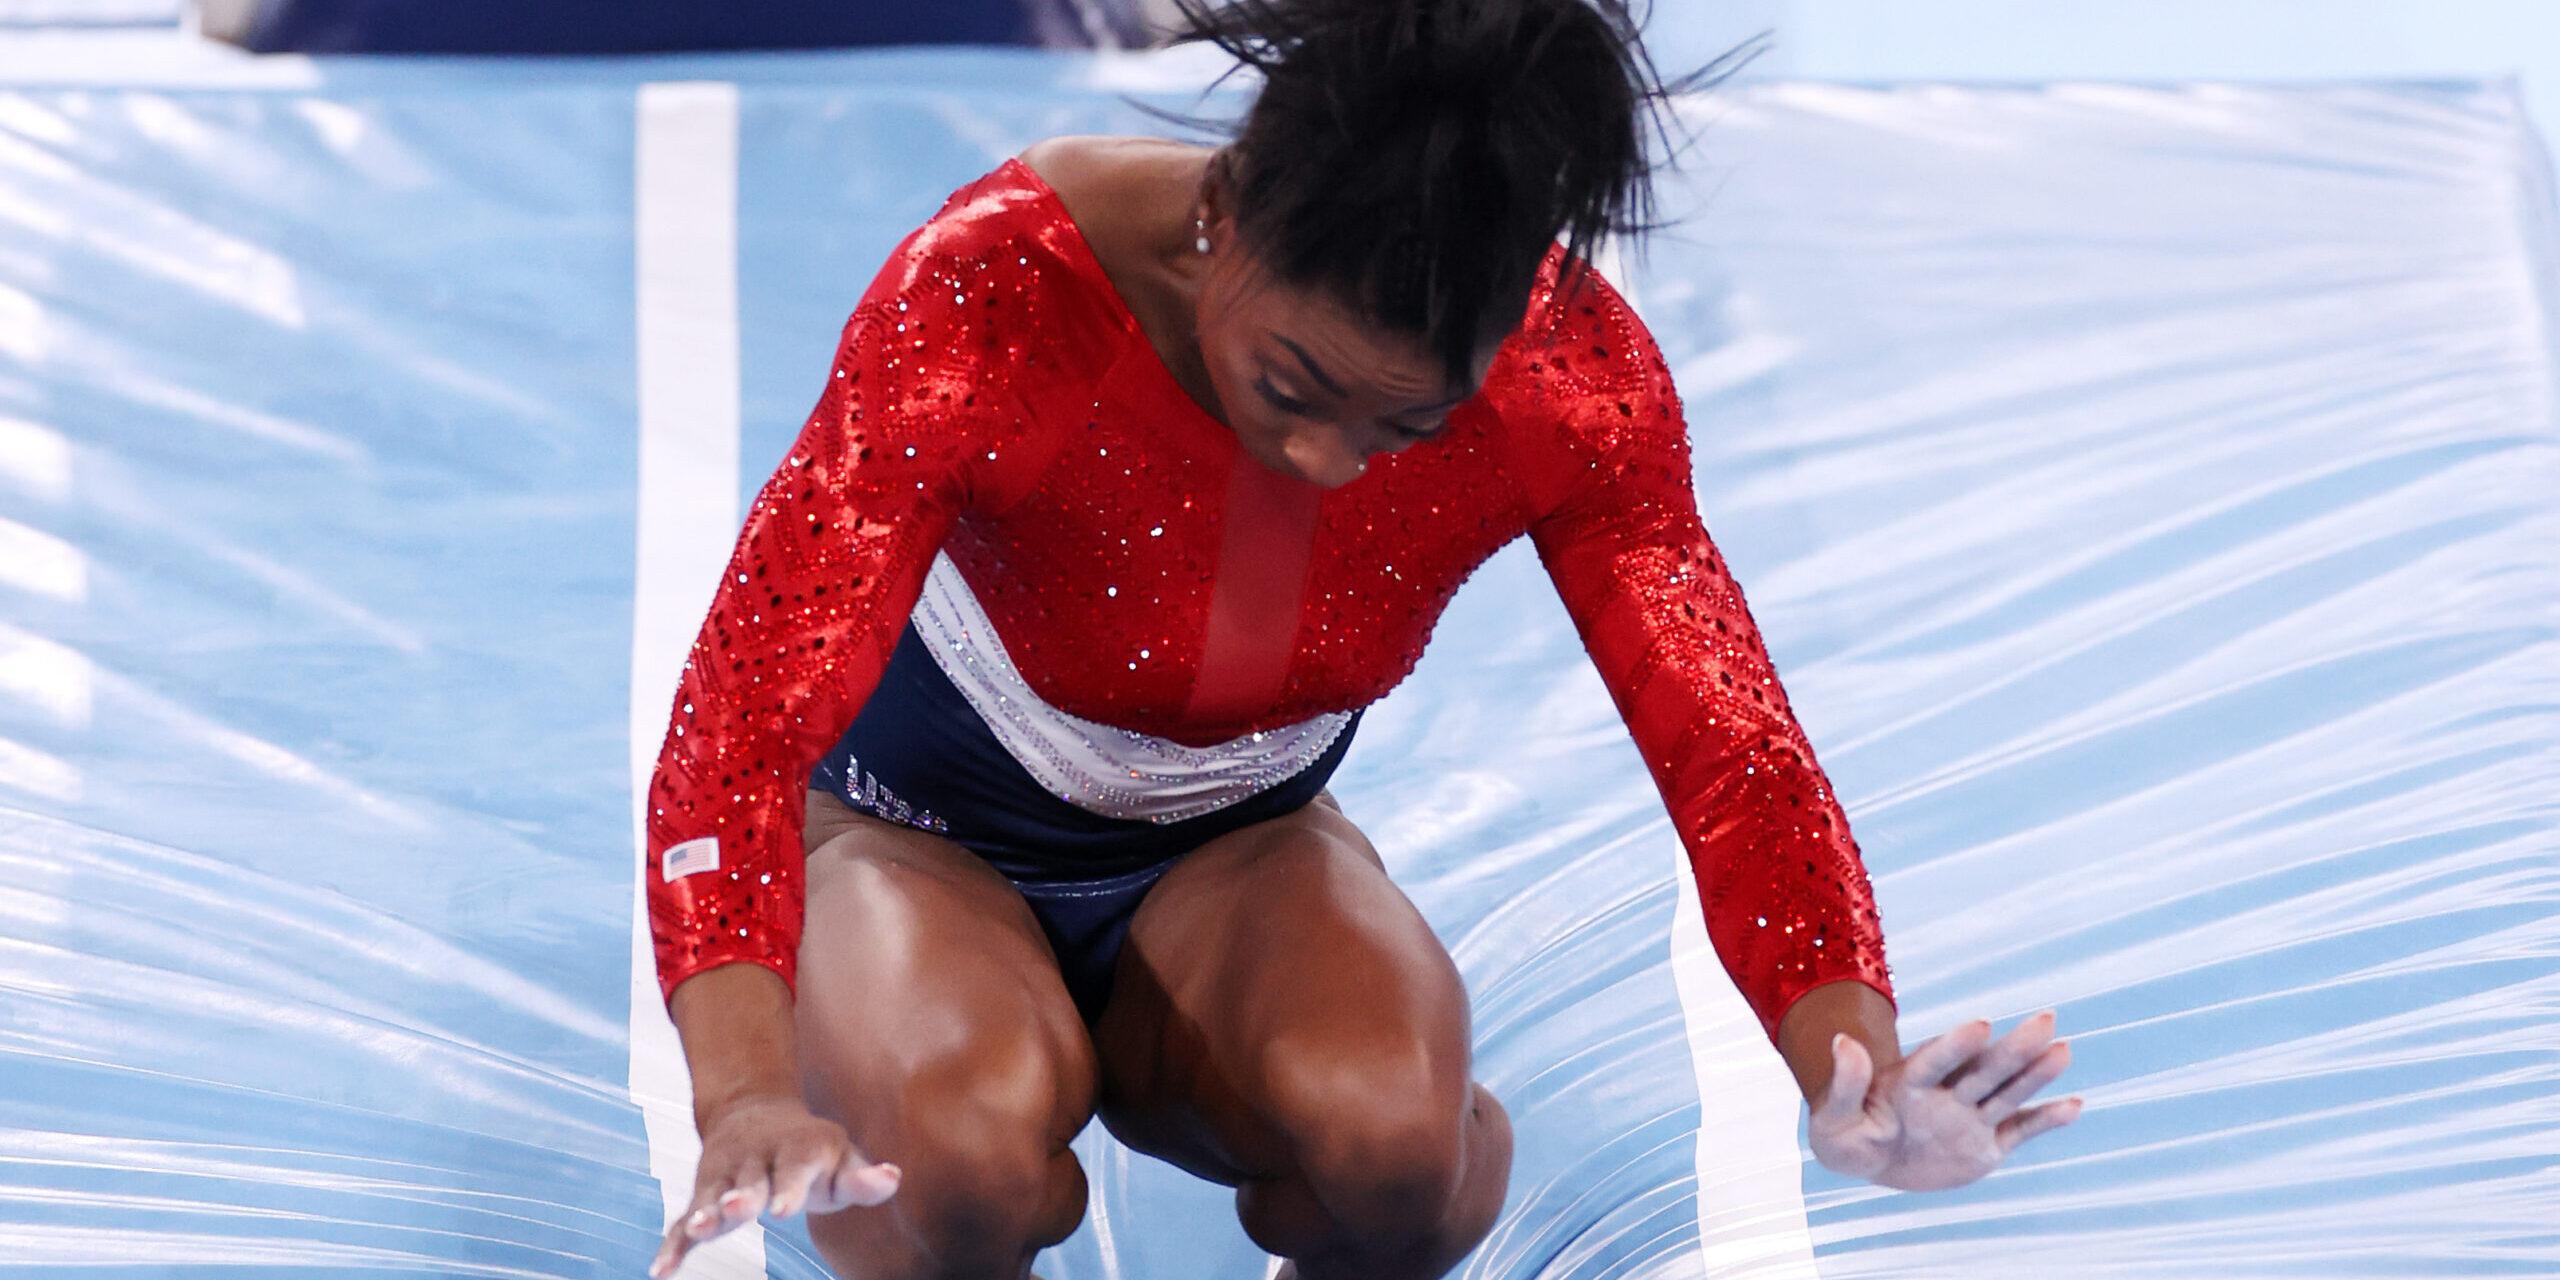 Simone Biles cau després del salt al poltre | Tòquio 2020